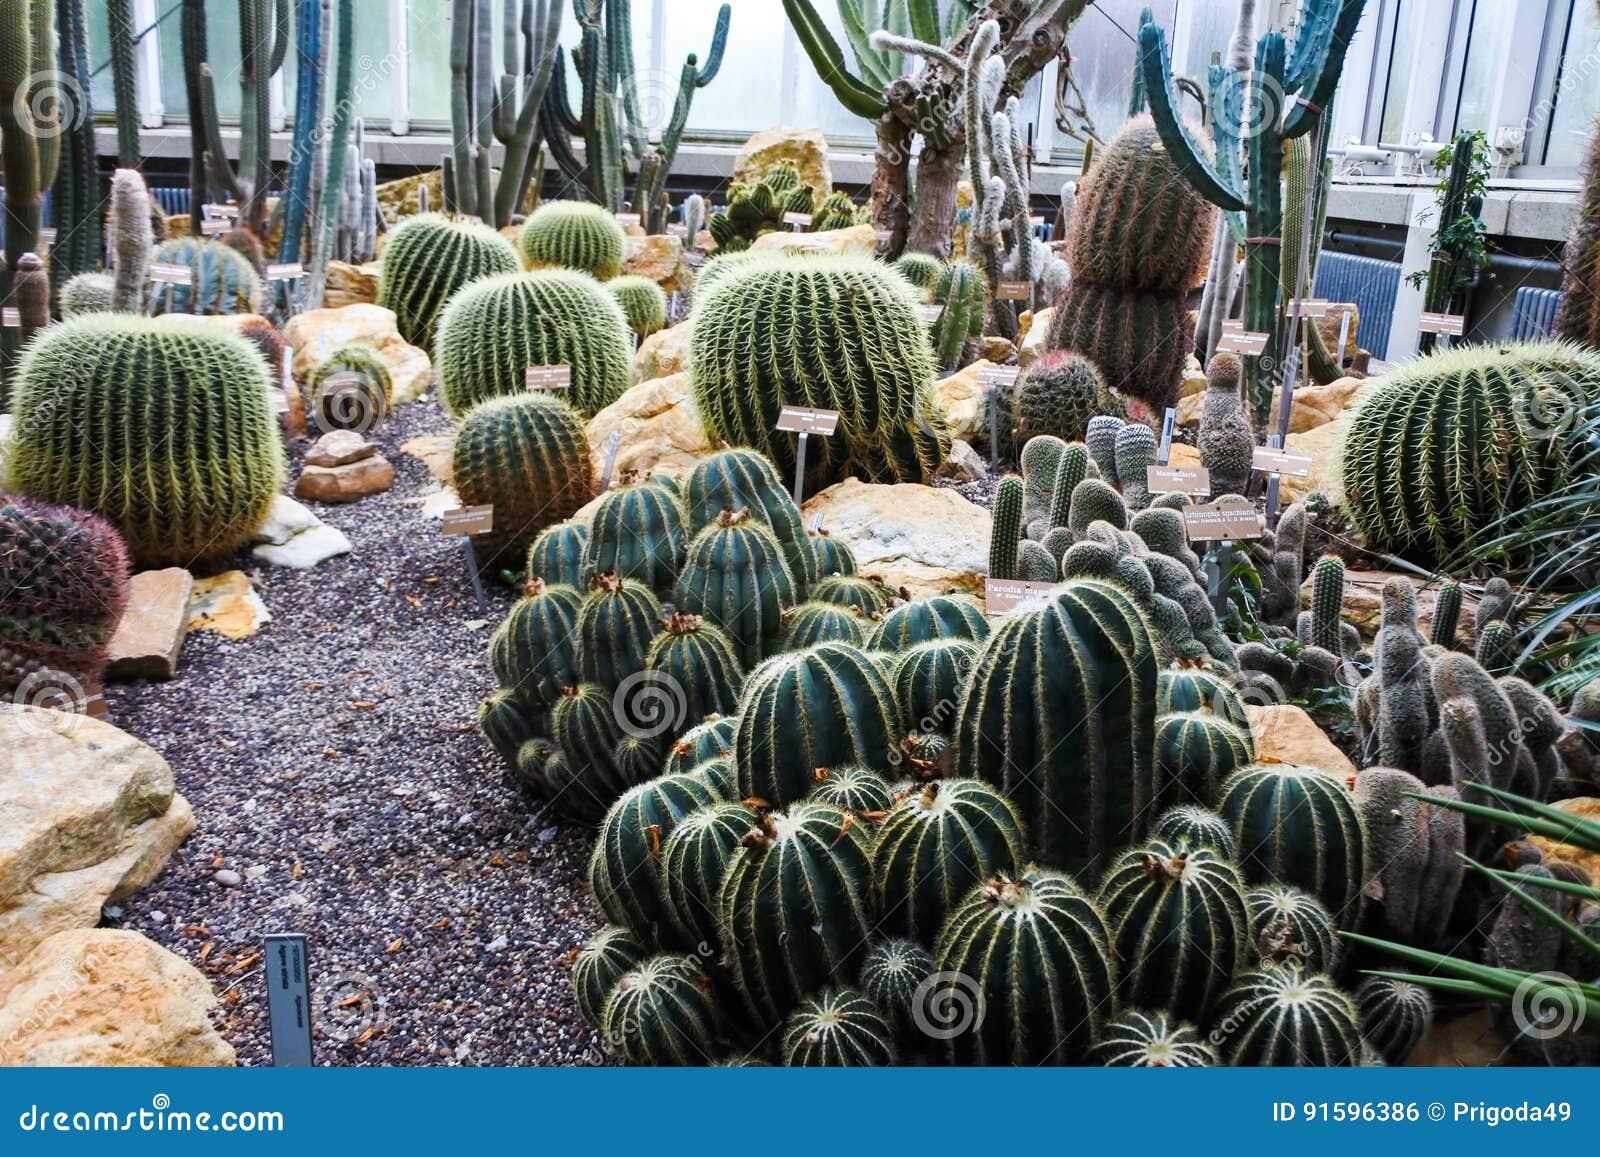 Cactus in a Botanical Garden in Geneva